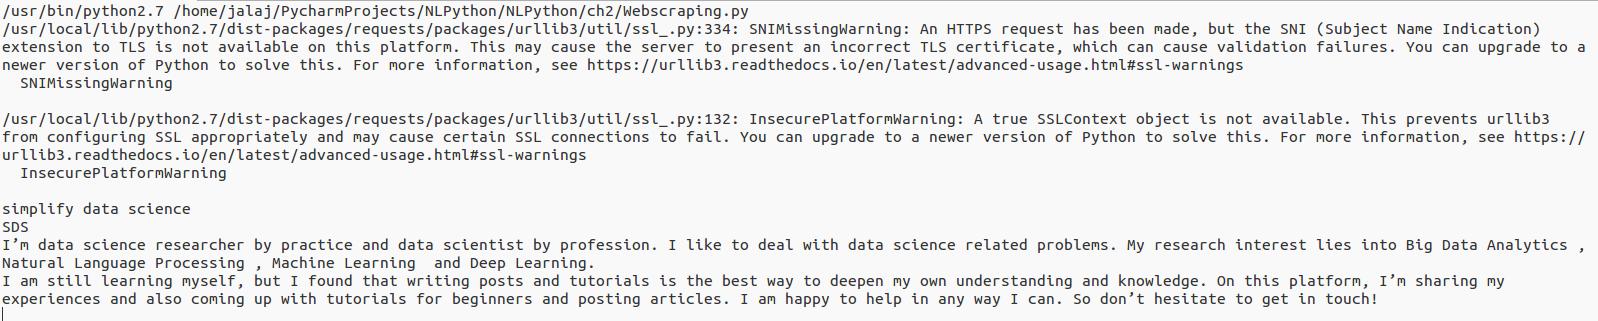 Web scraping - Python Natural Language Processing